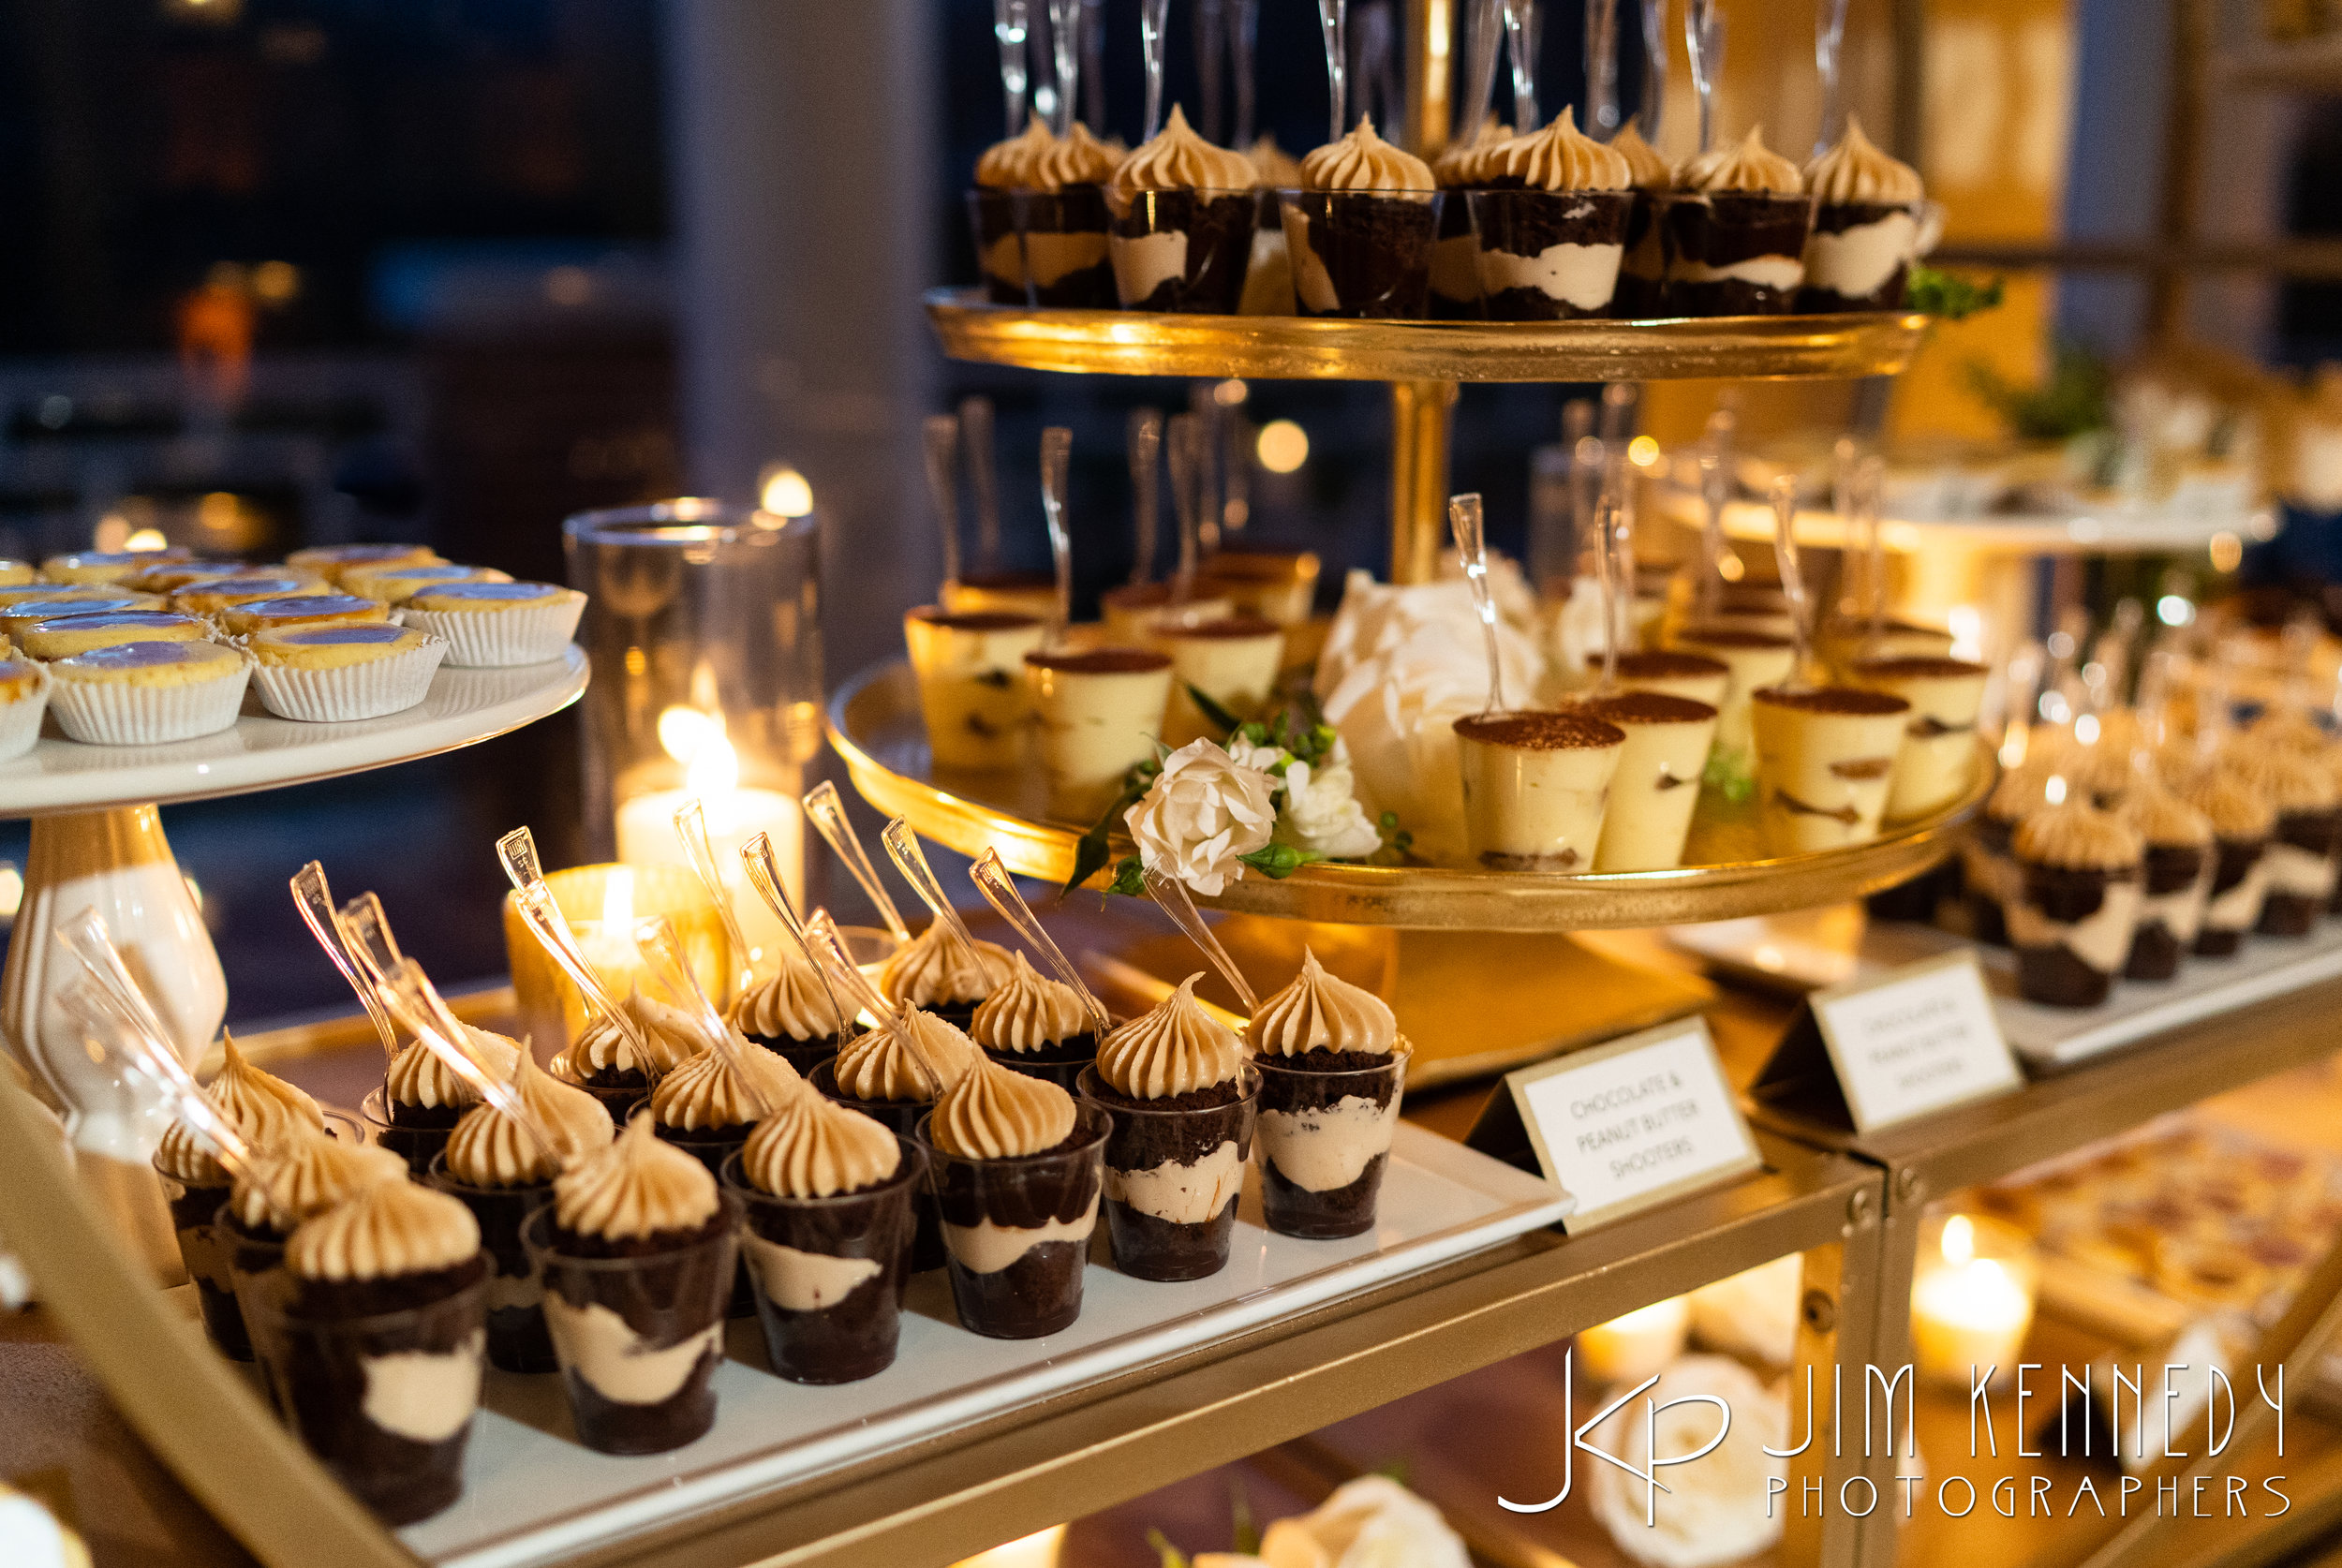 sherwood_country_club_wedding-2952.jpg